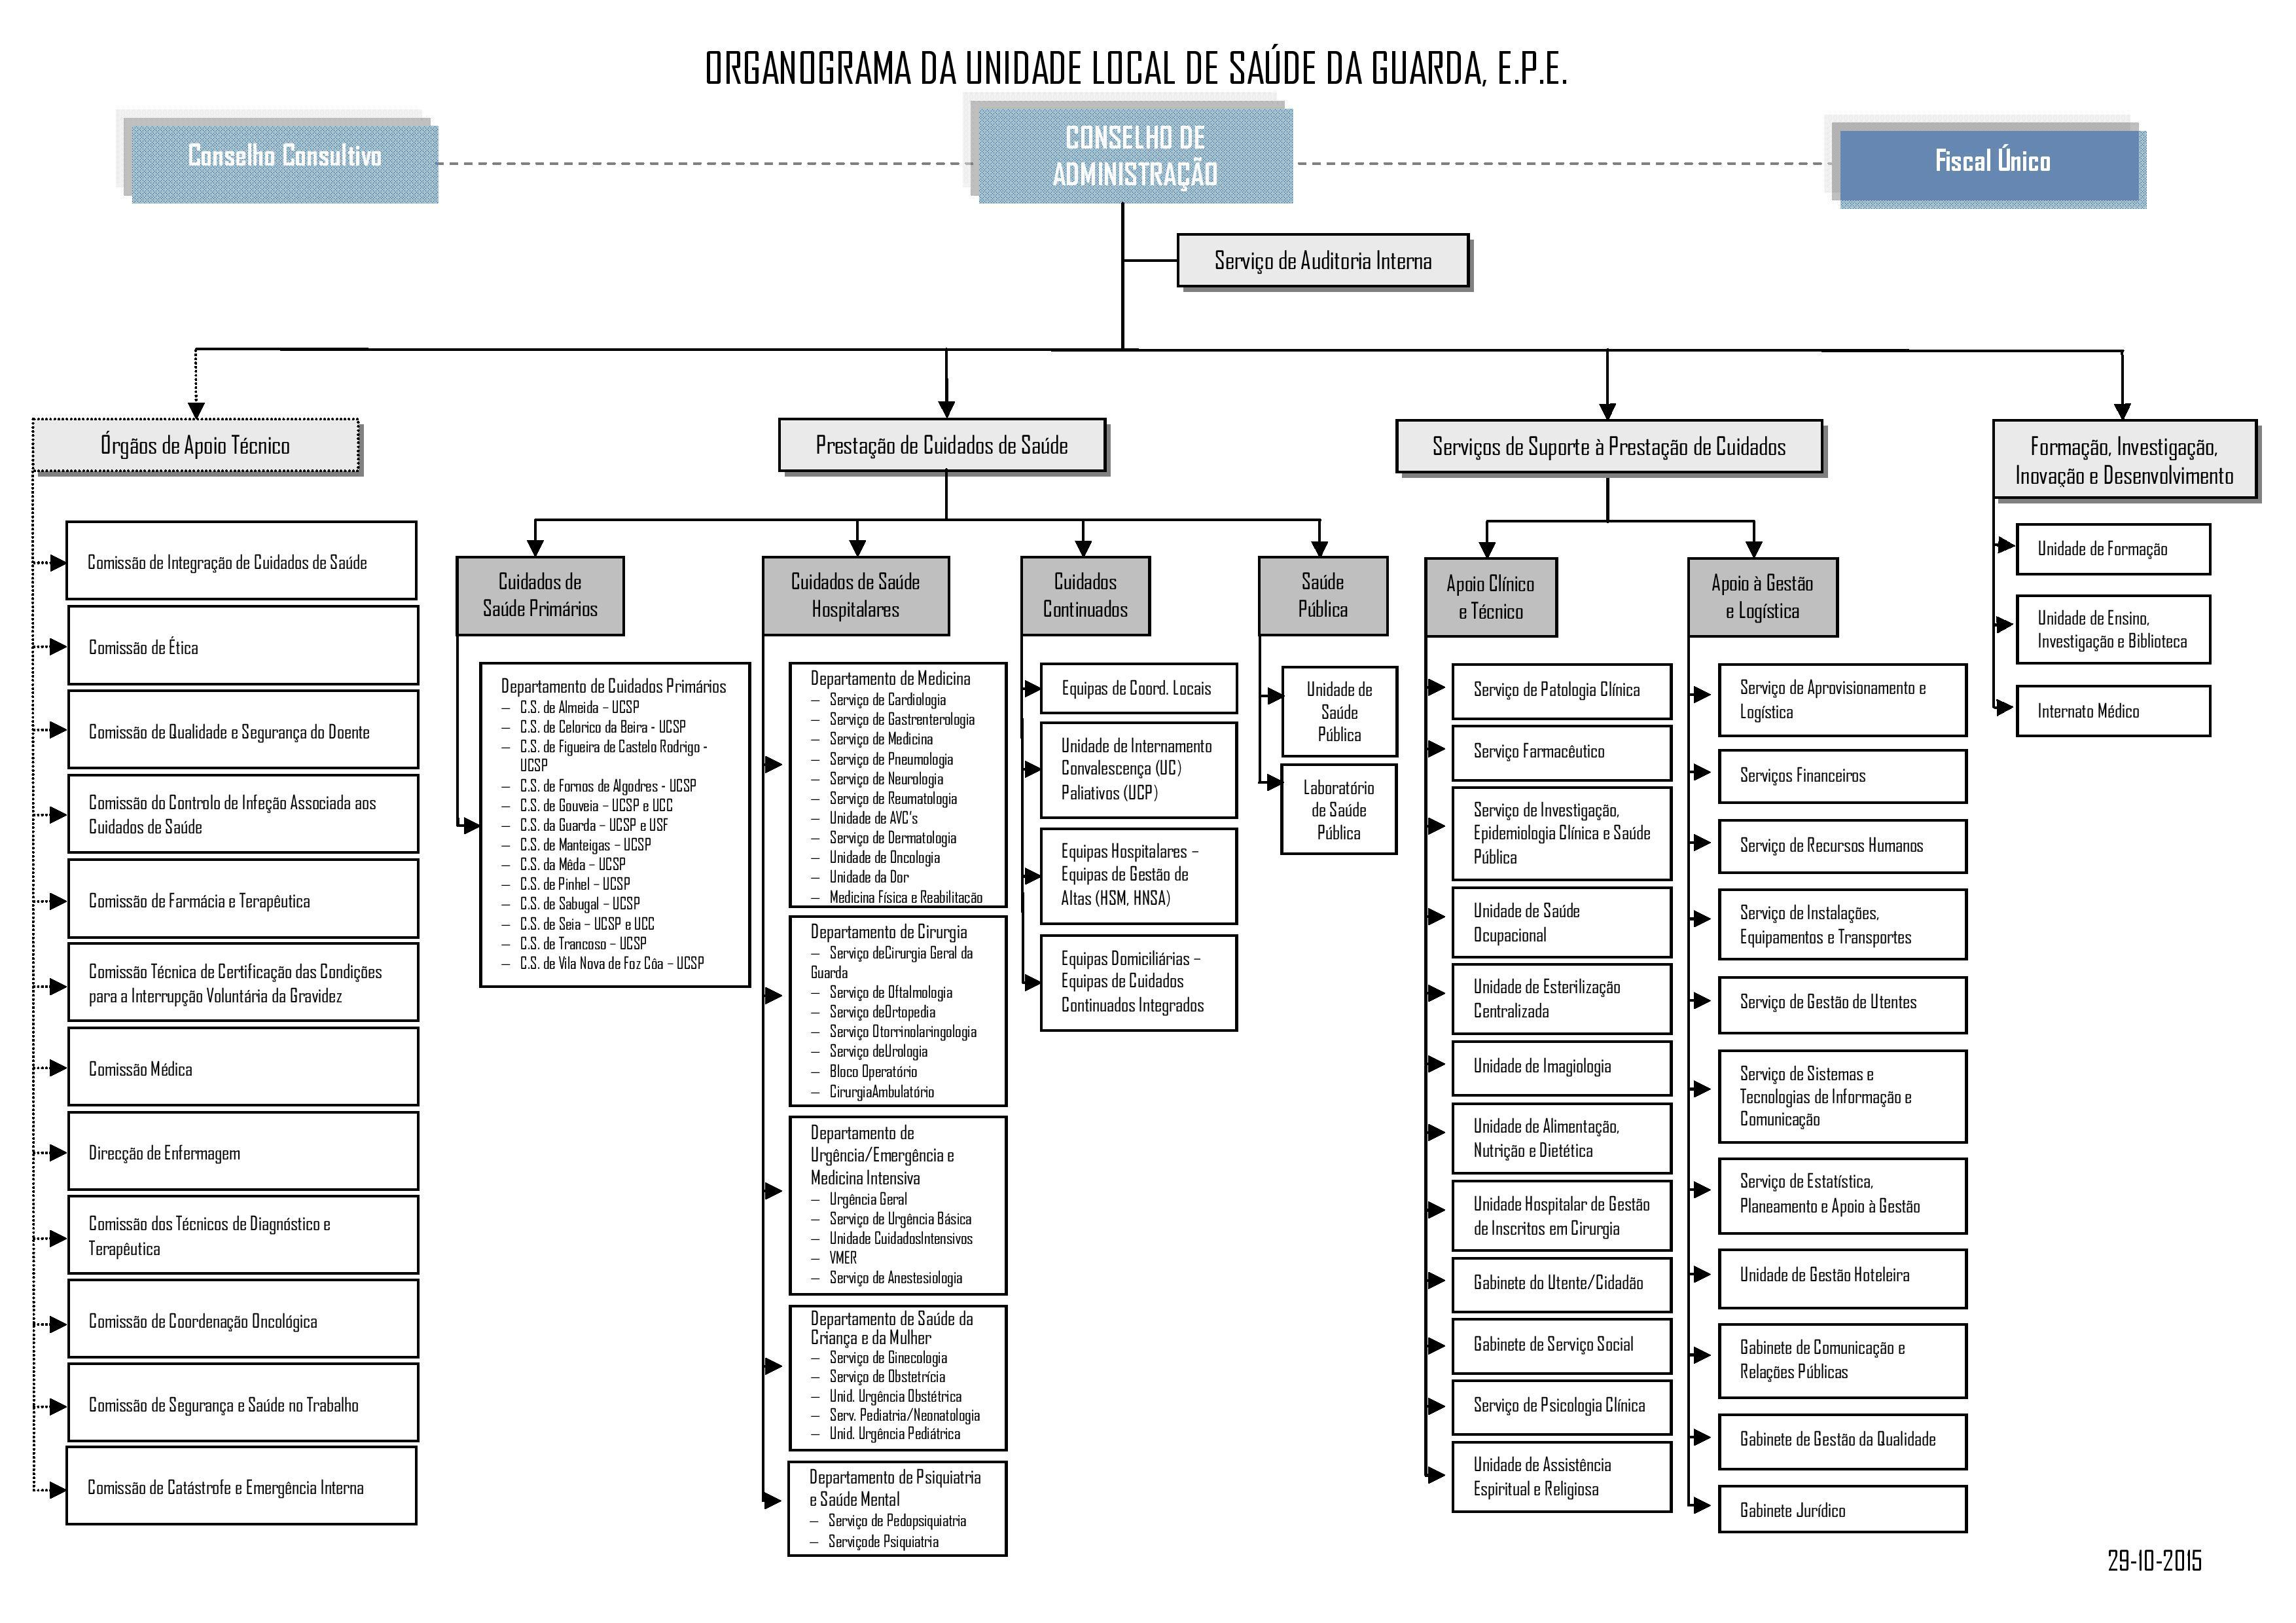 ULSGuarda_Organograma-page-001 (1)